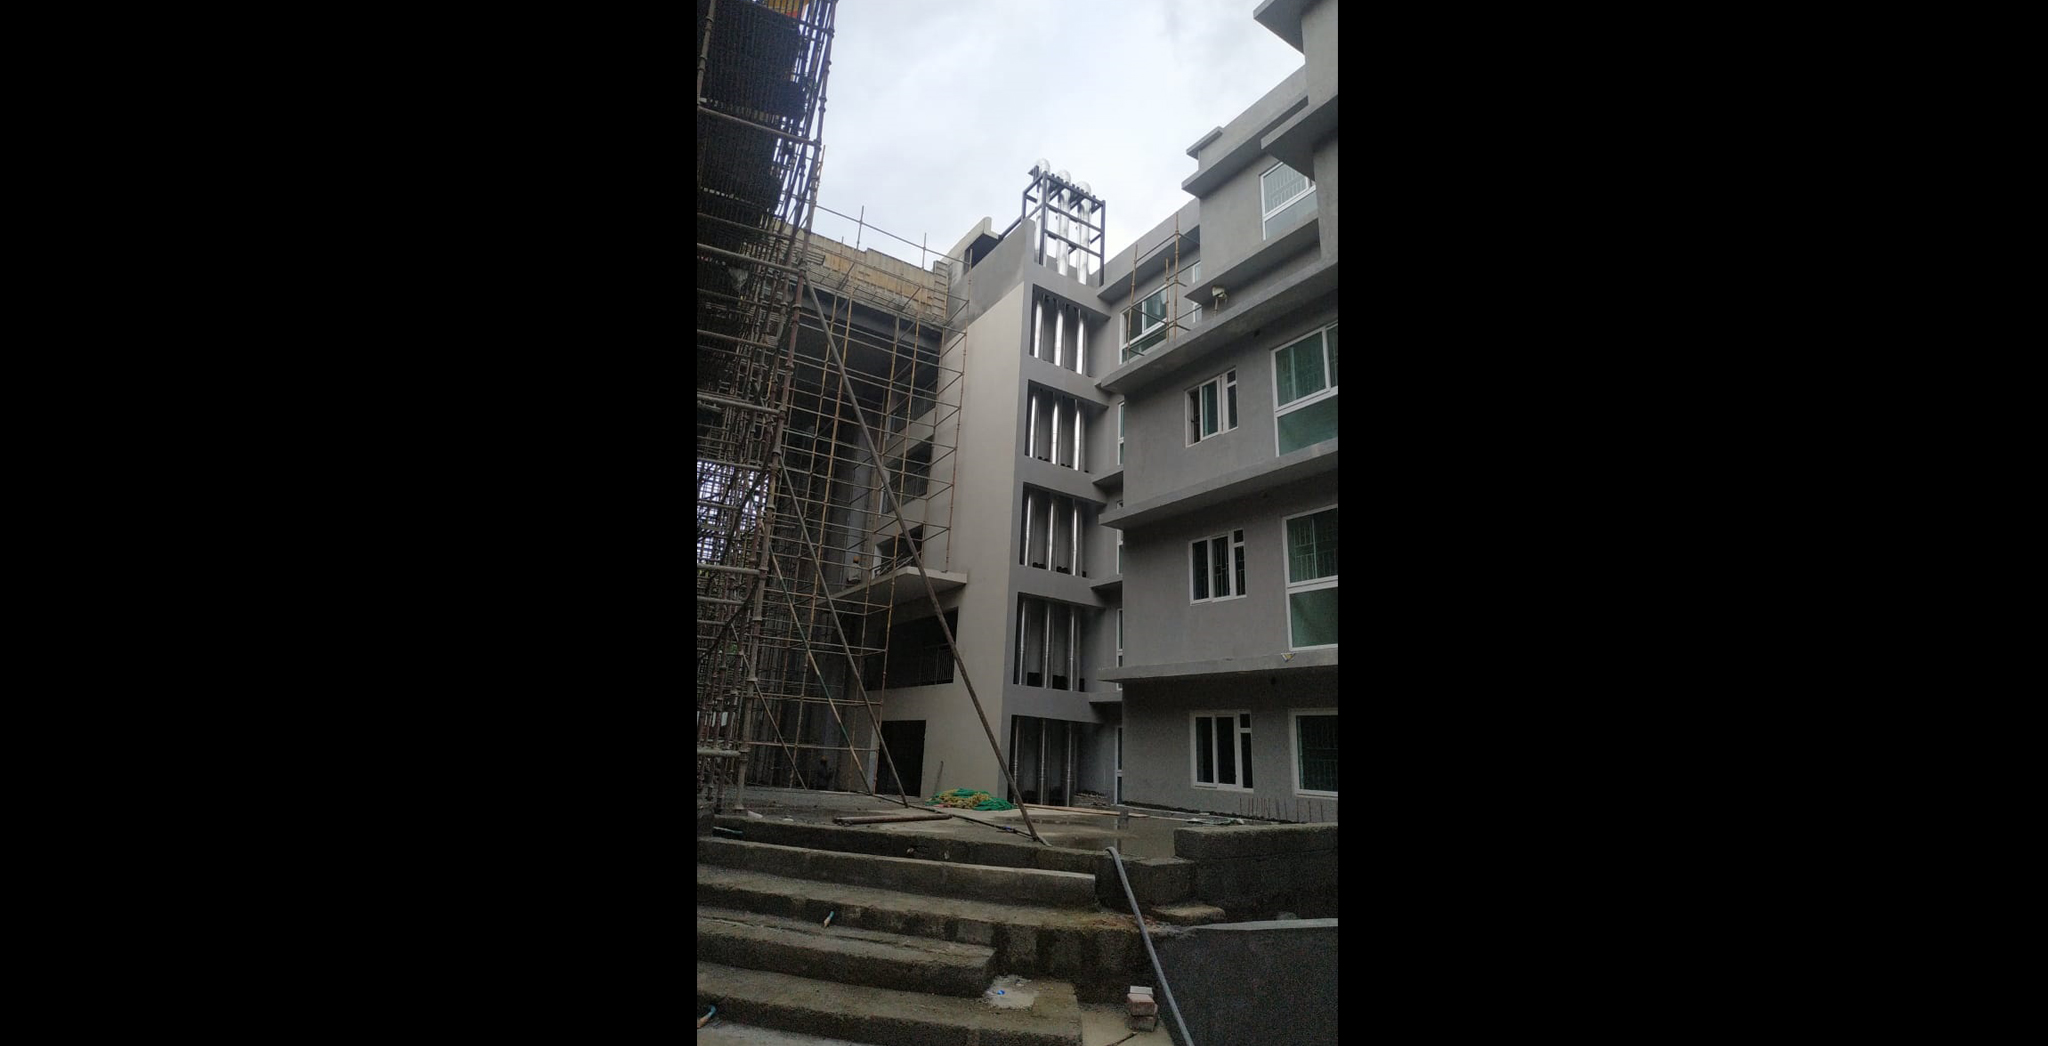 Sep 2021 - J block windows